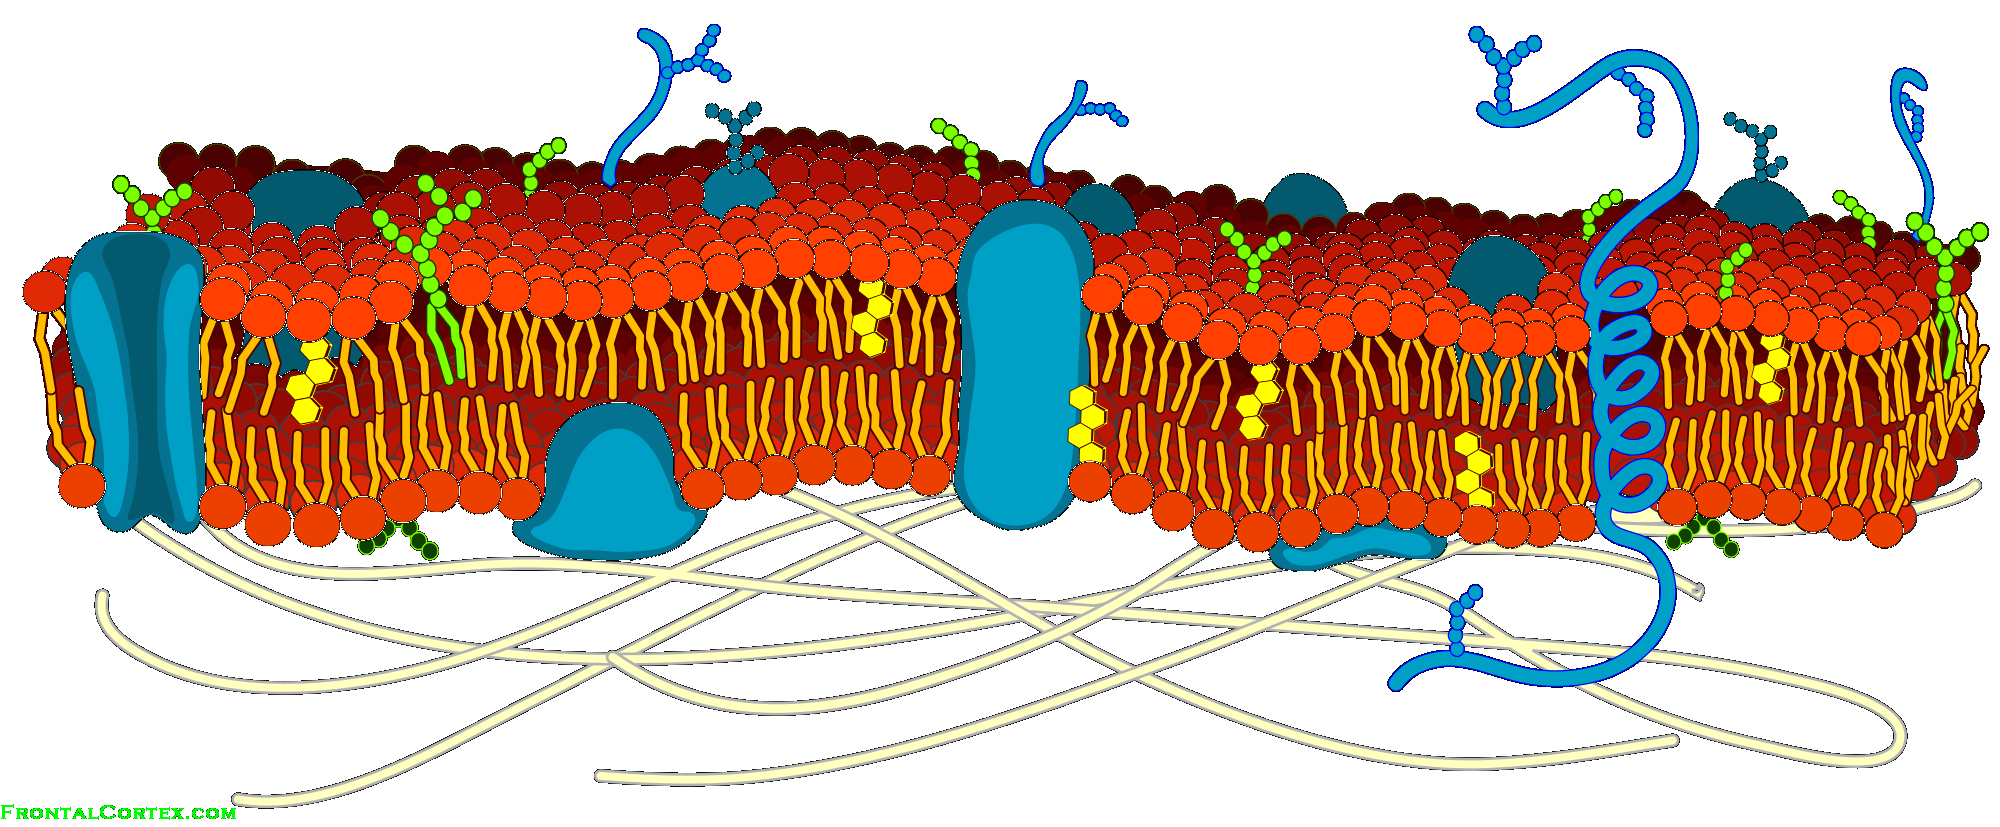 Image Cell Membrane Detailed Diagram B